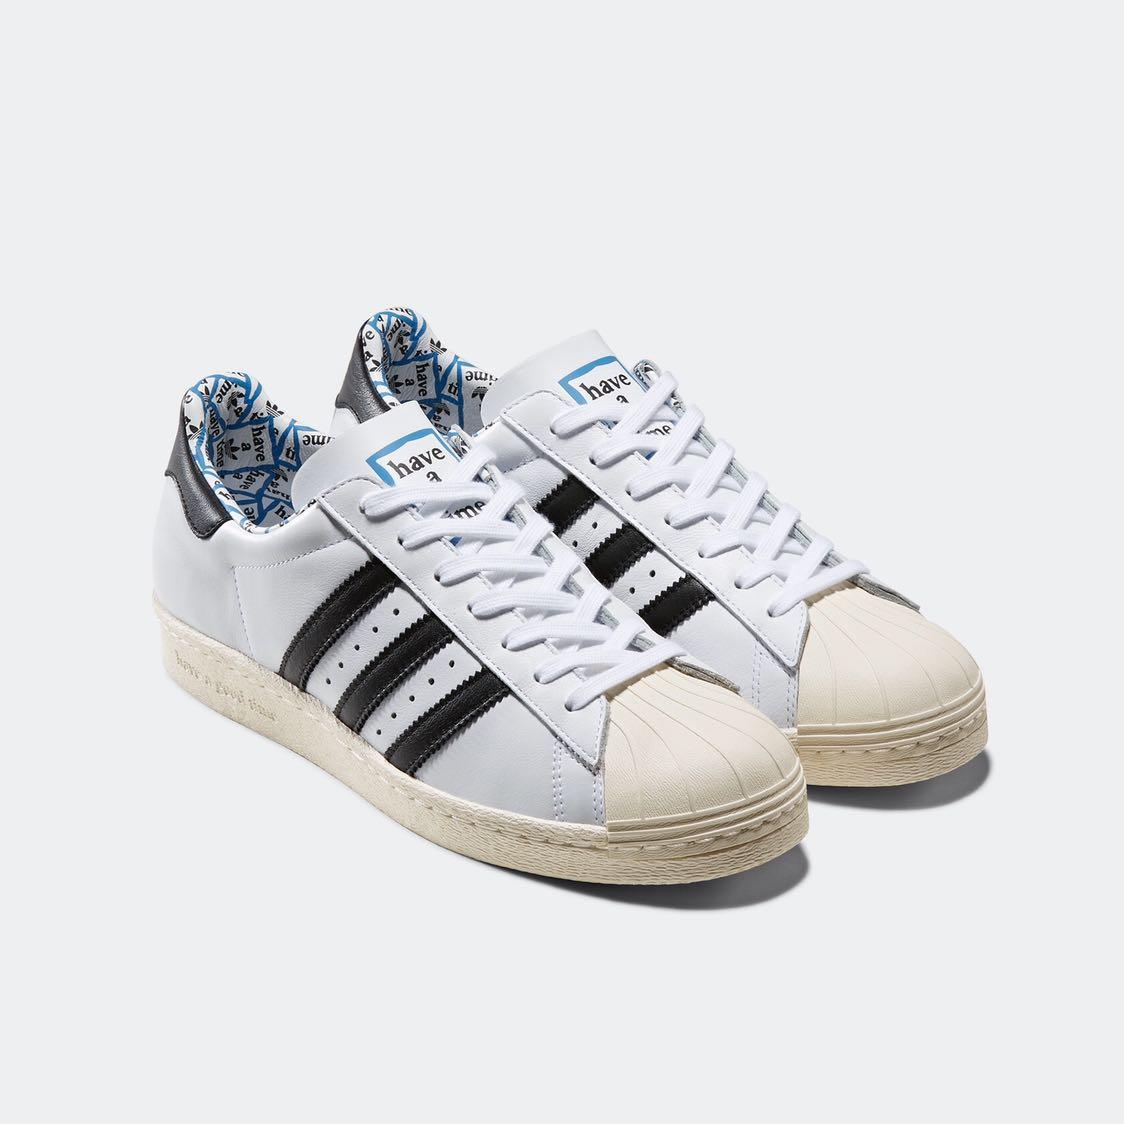 adidas superstar shoes hk price